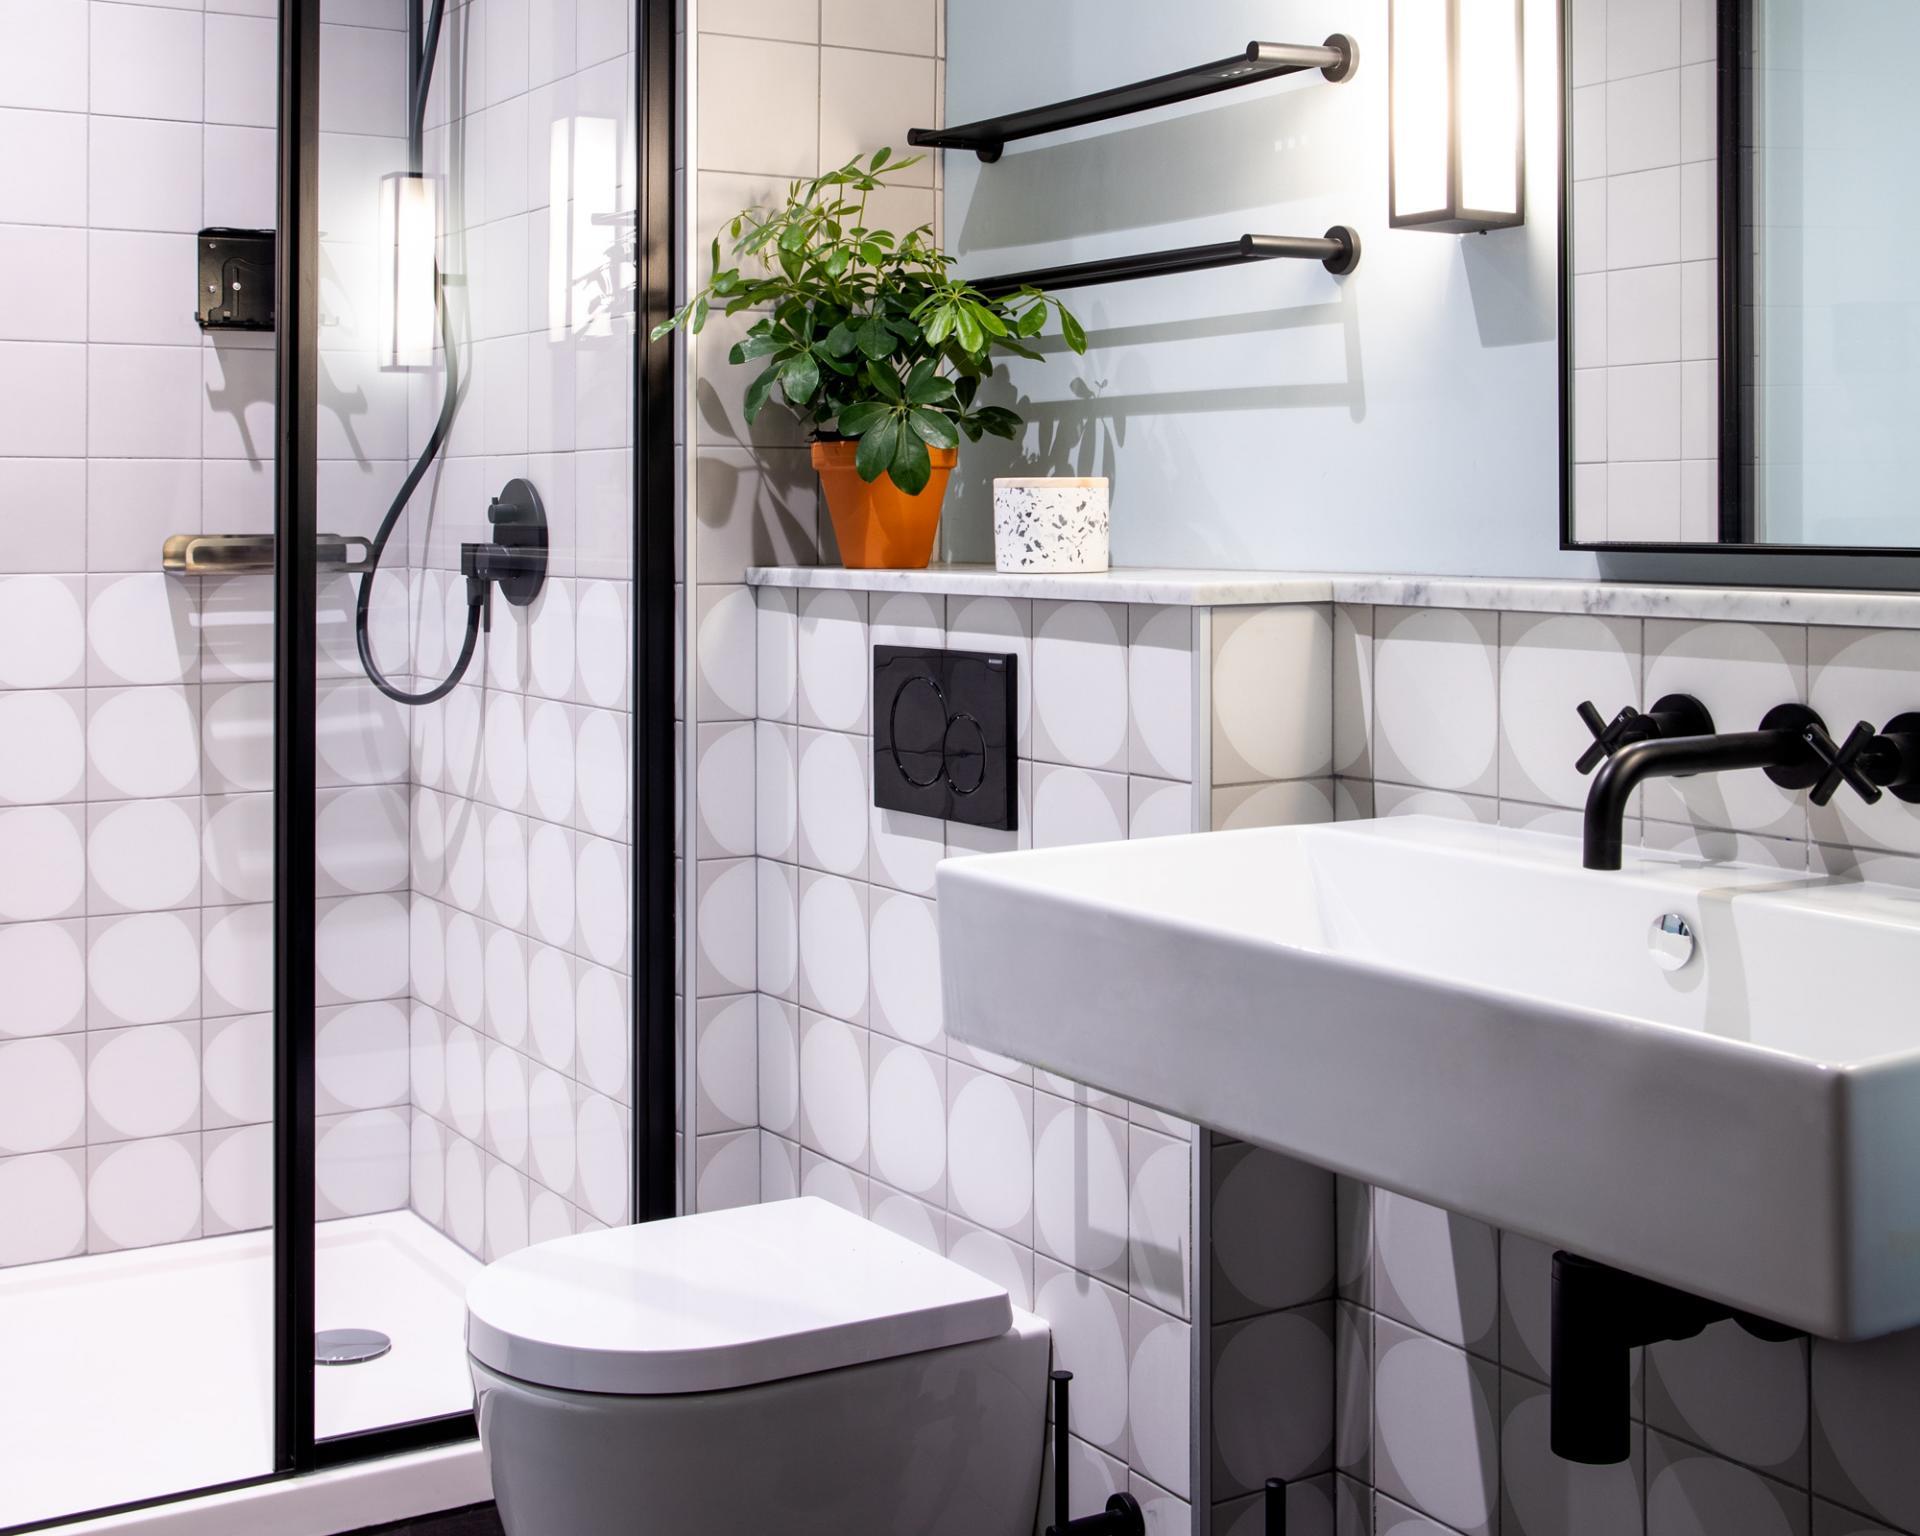 Bathroom at Zanzibar Locke Apartments, Centre, Dublin